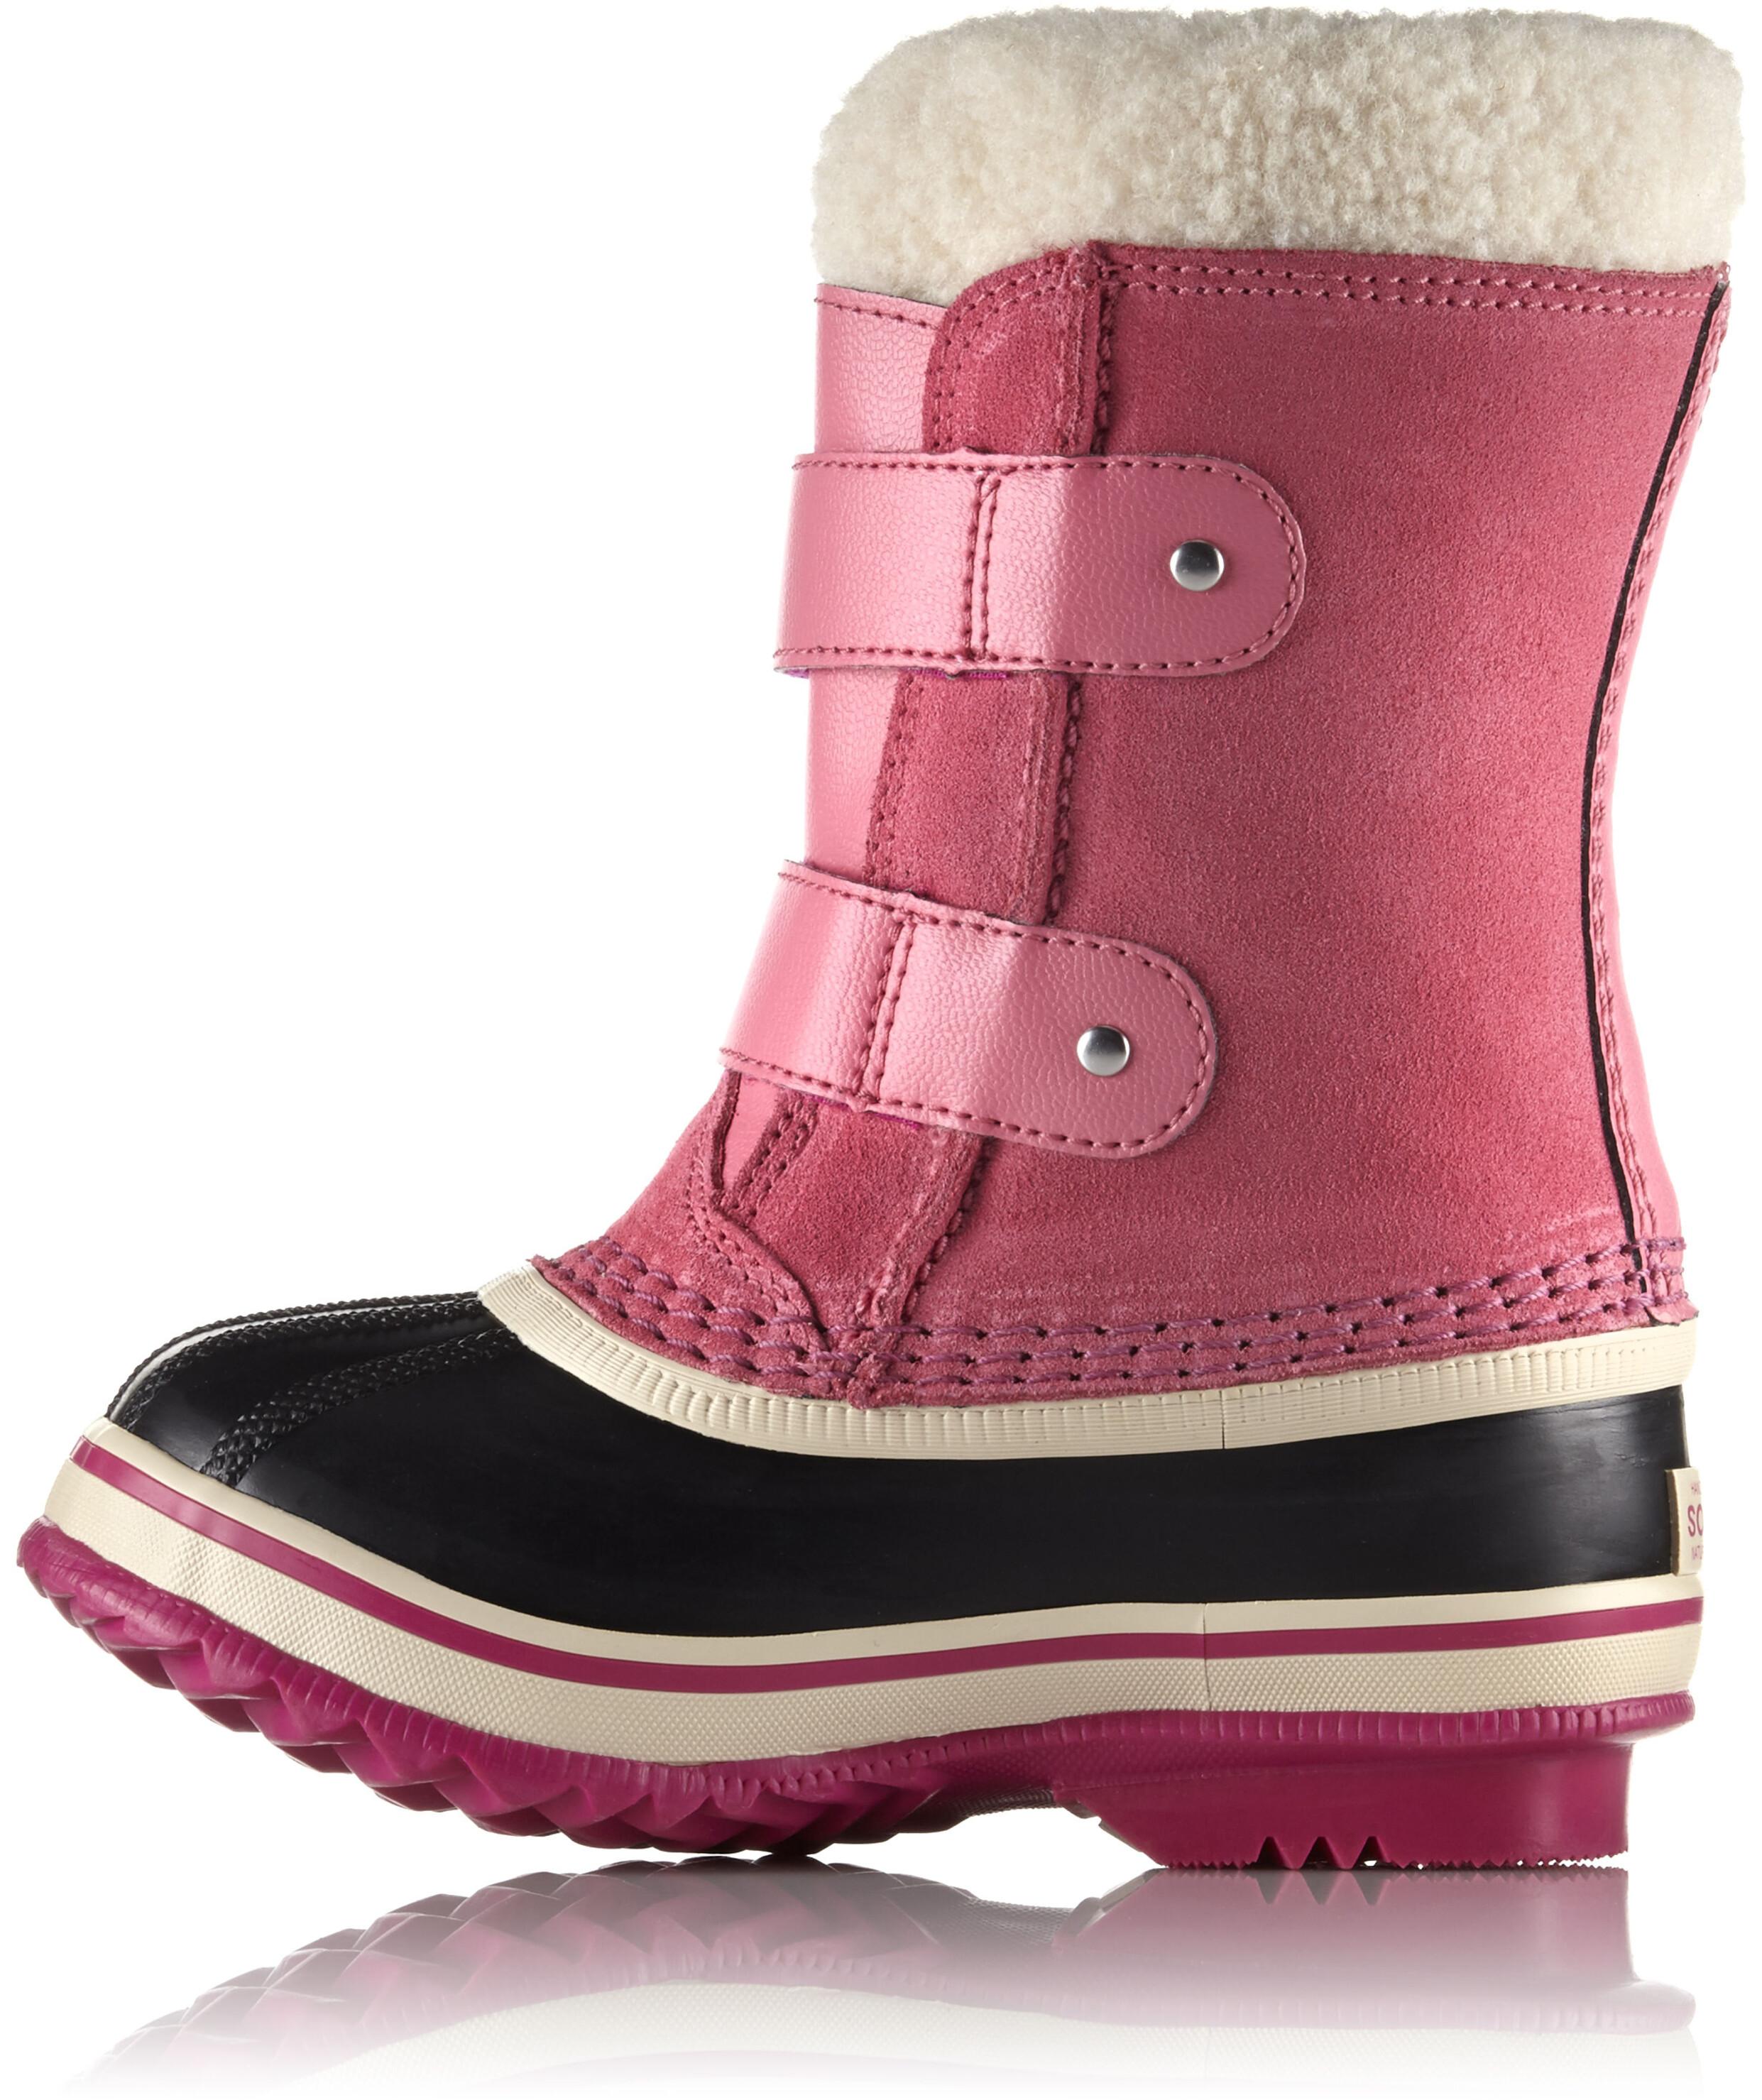 1ddb9fa758c Sorel 1964 Pac Strap Bottes Enfant, tropic pink